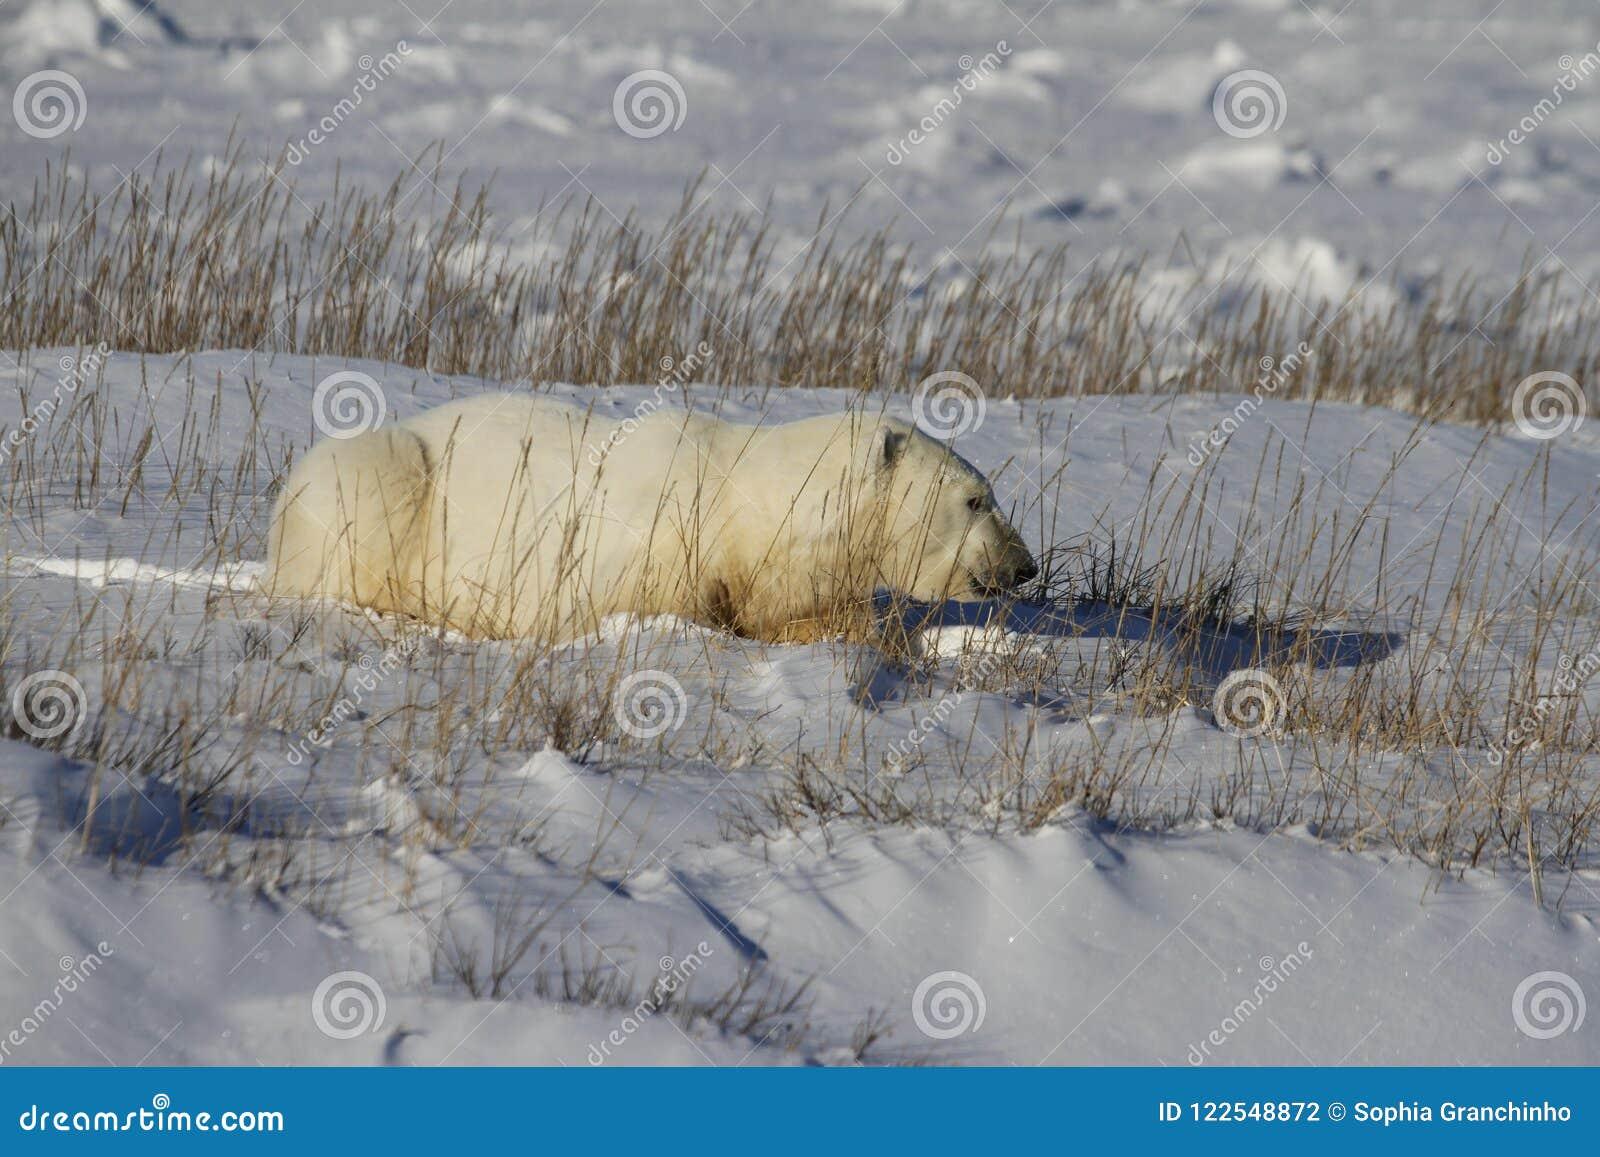 Polar Bear, Ursus Maritimus, lying down between grass and snow, near the shores of Hudson Bay